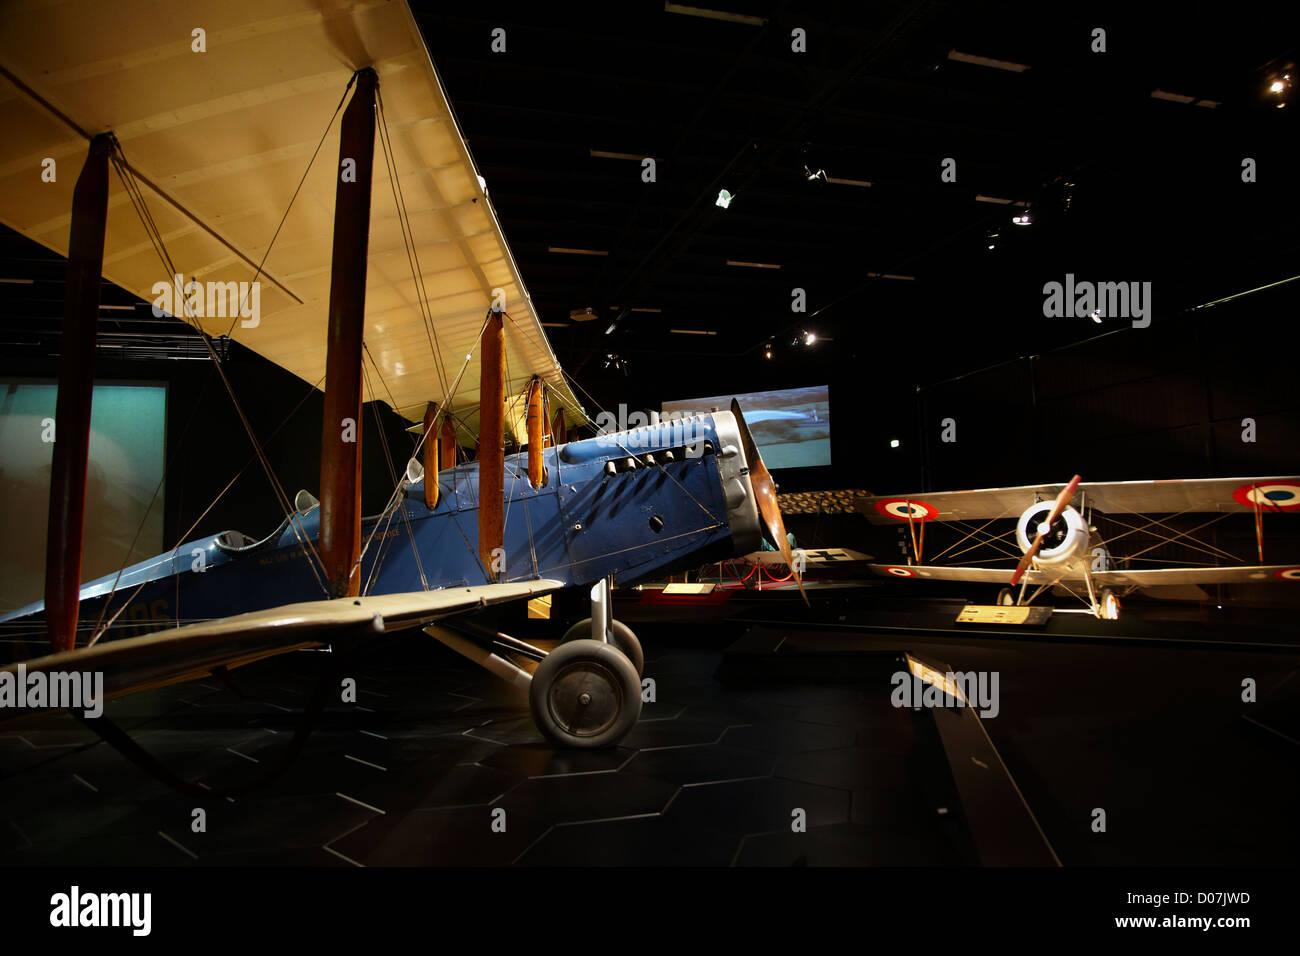 De Havilland D.H.4 biplane, Omaka Aviation Heritage Centre, Blenheim, Marlborough, South Island, New Zealand - Stock Image